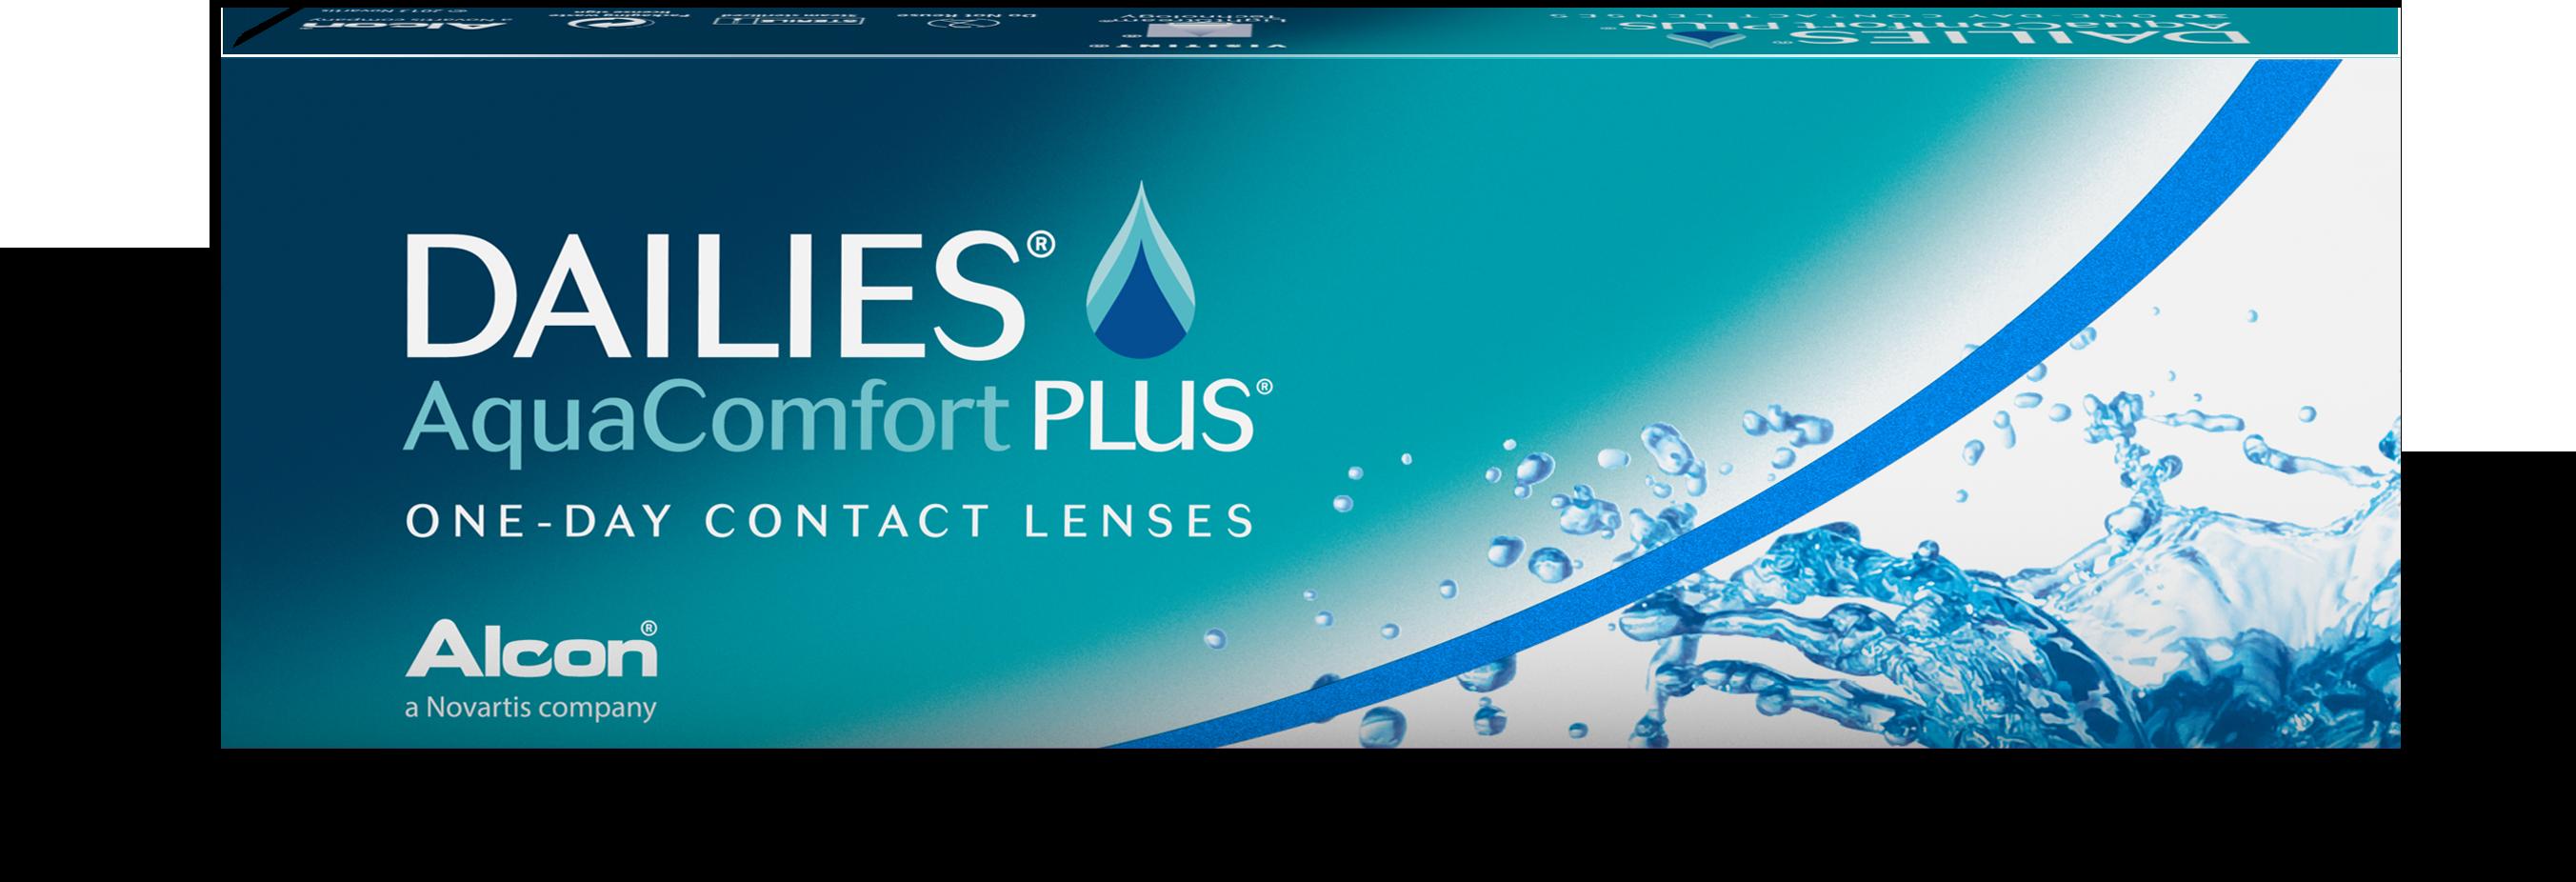 contact lenses europe Szukaj w Google One day contact